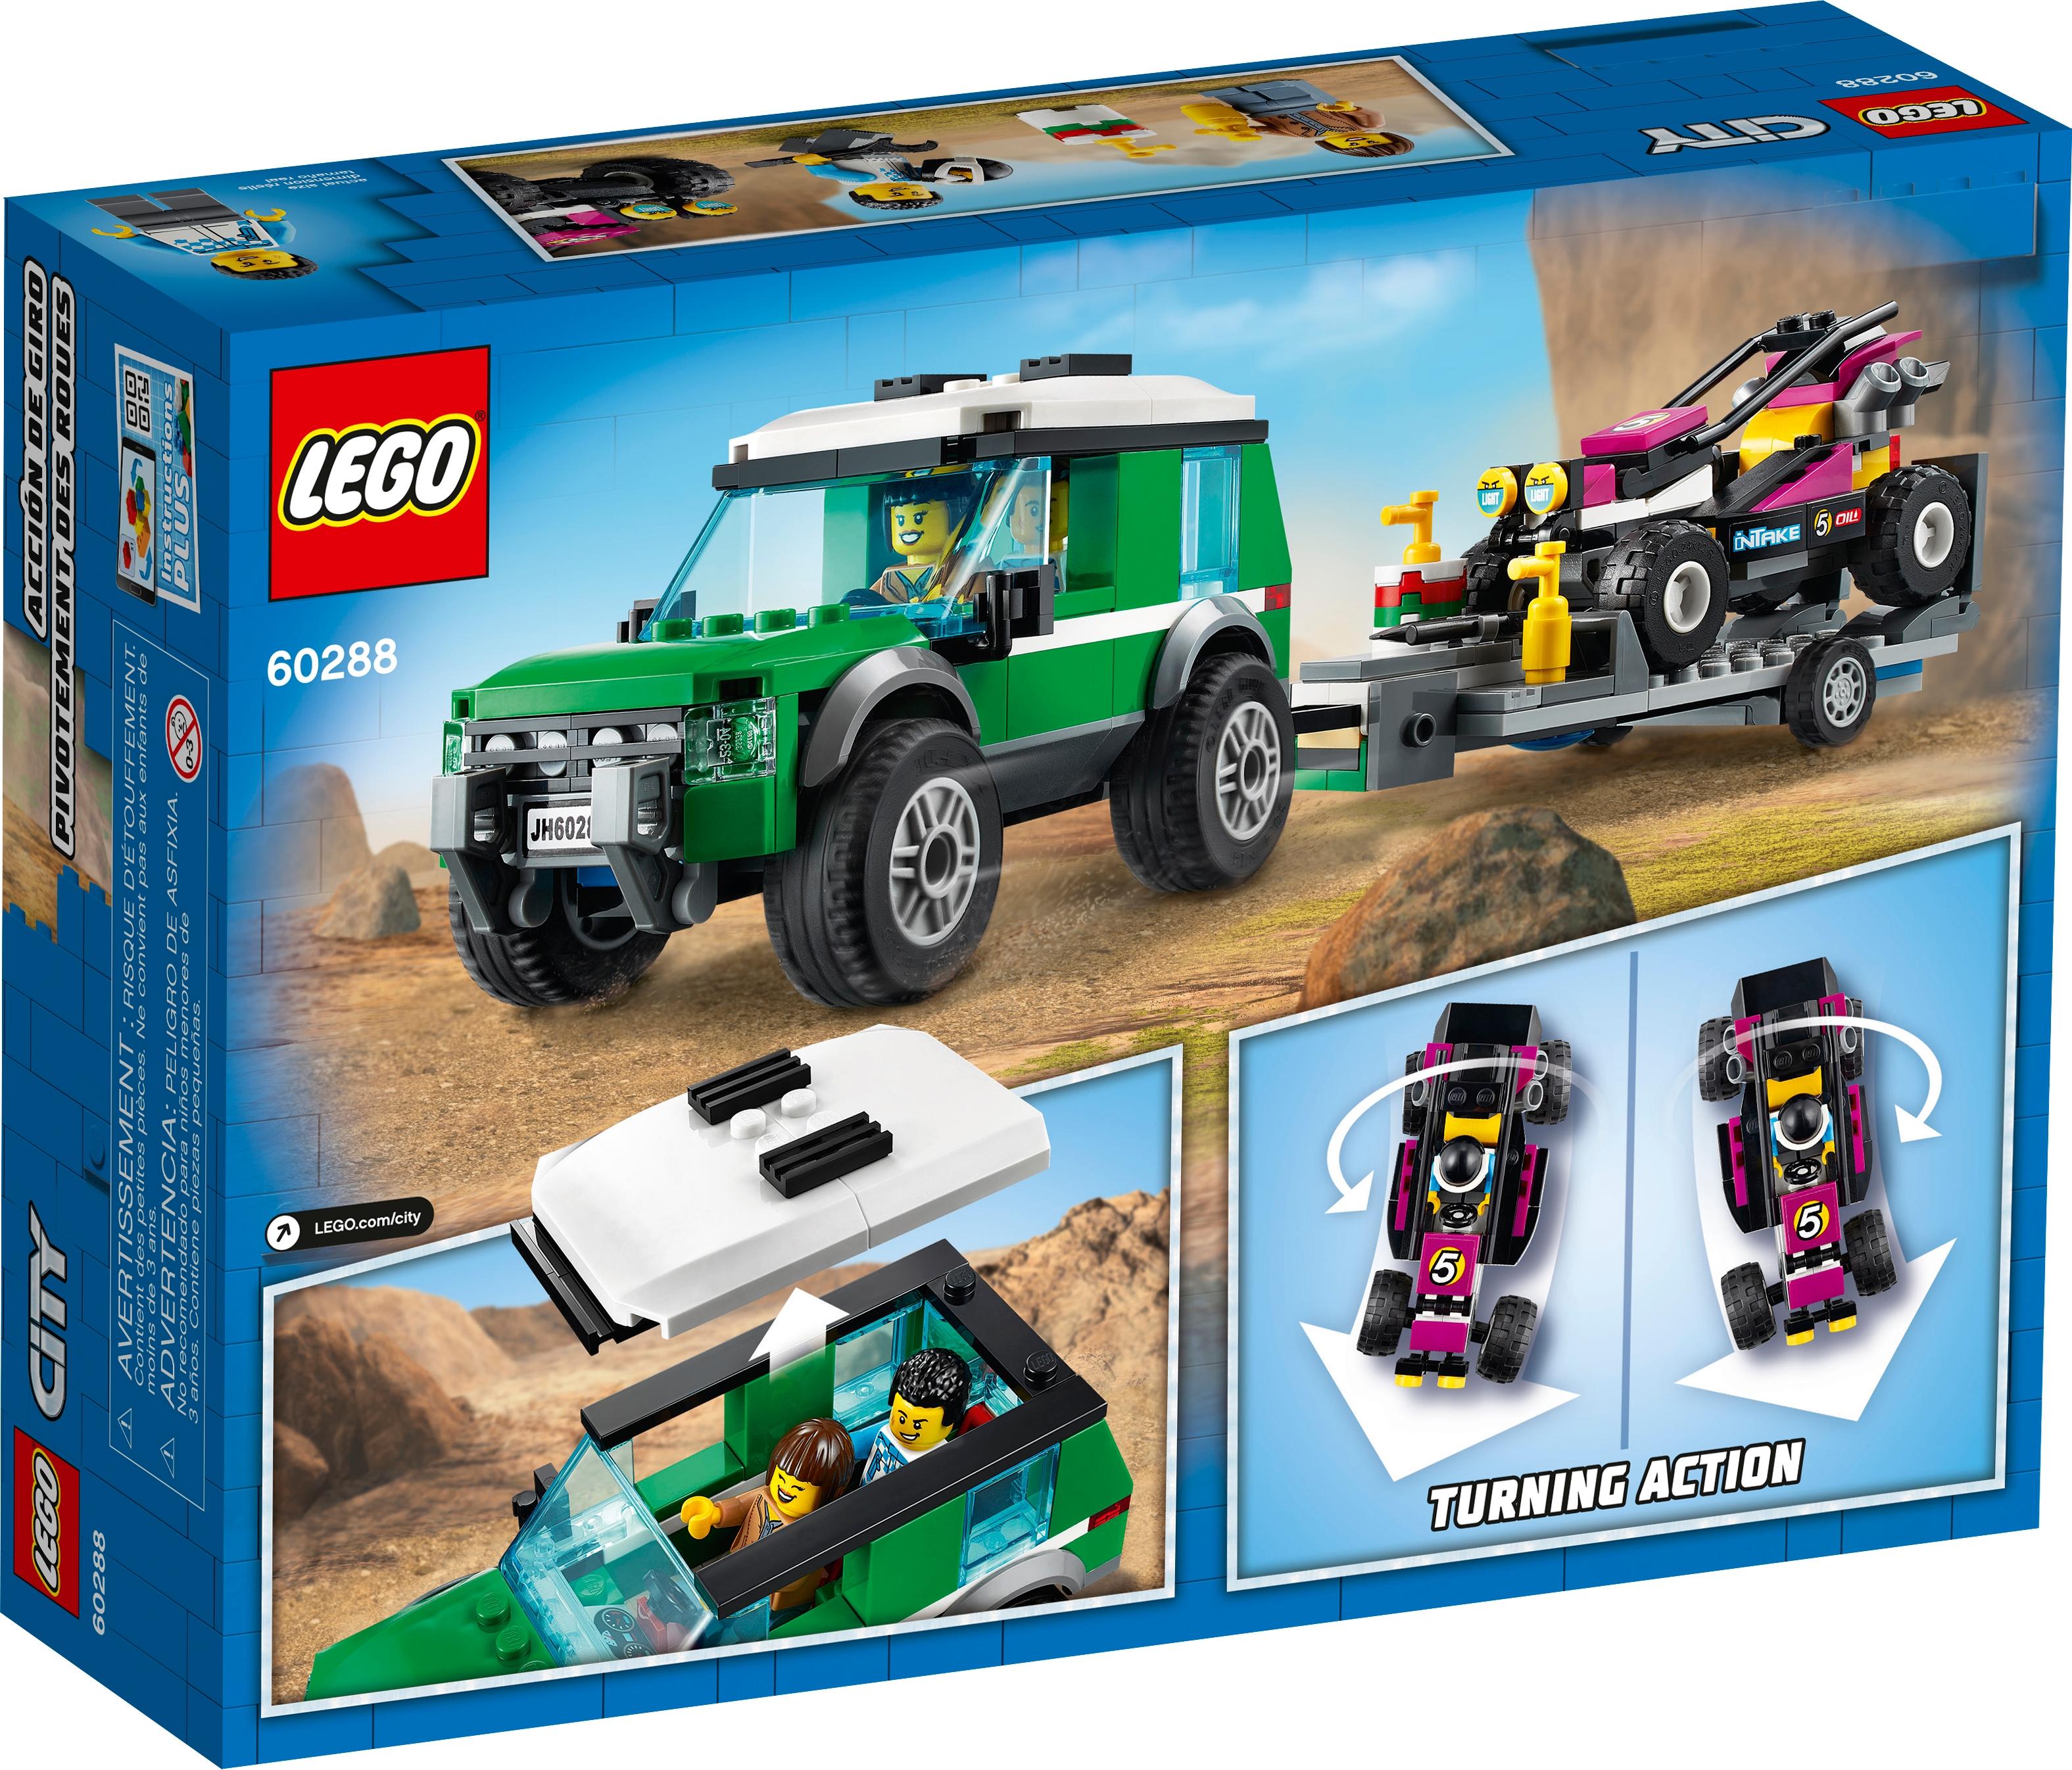 LEGO City 60288 Transport med racerbuggy